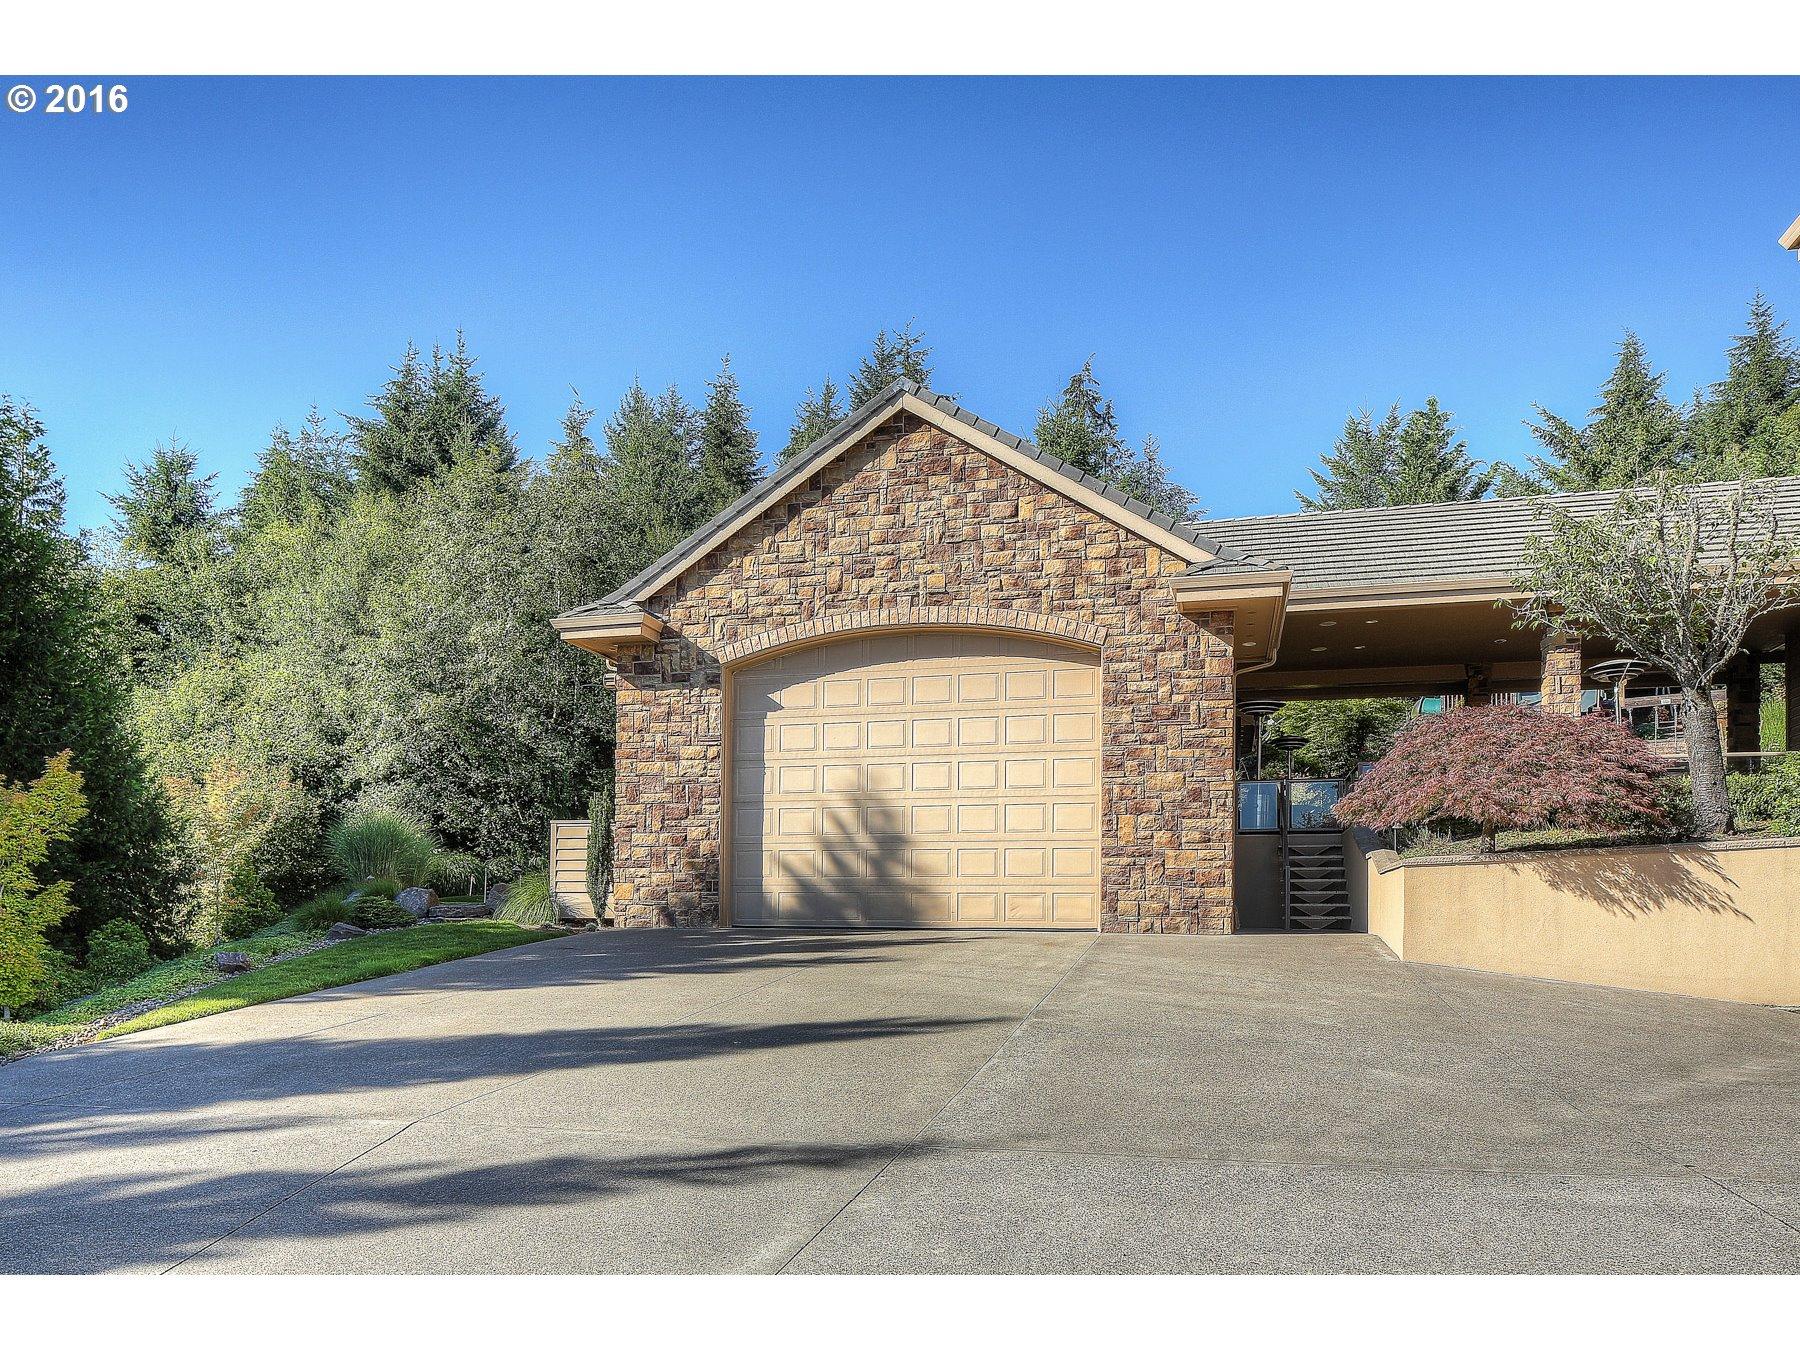 Homes For Rent In Brush Prairie Wa